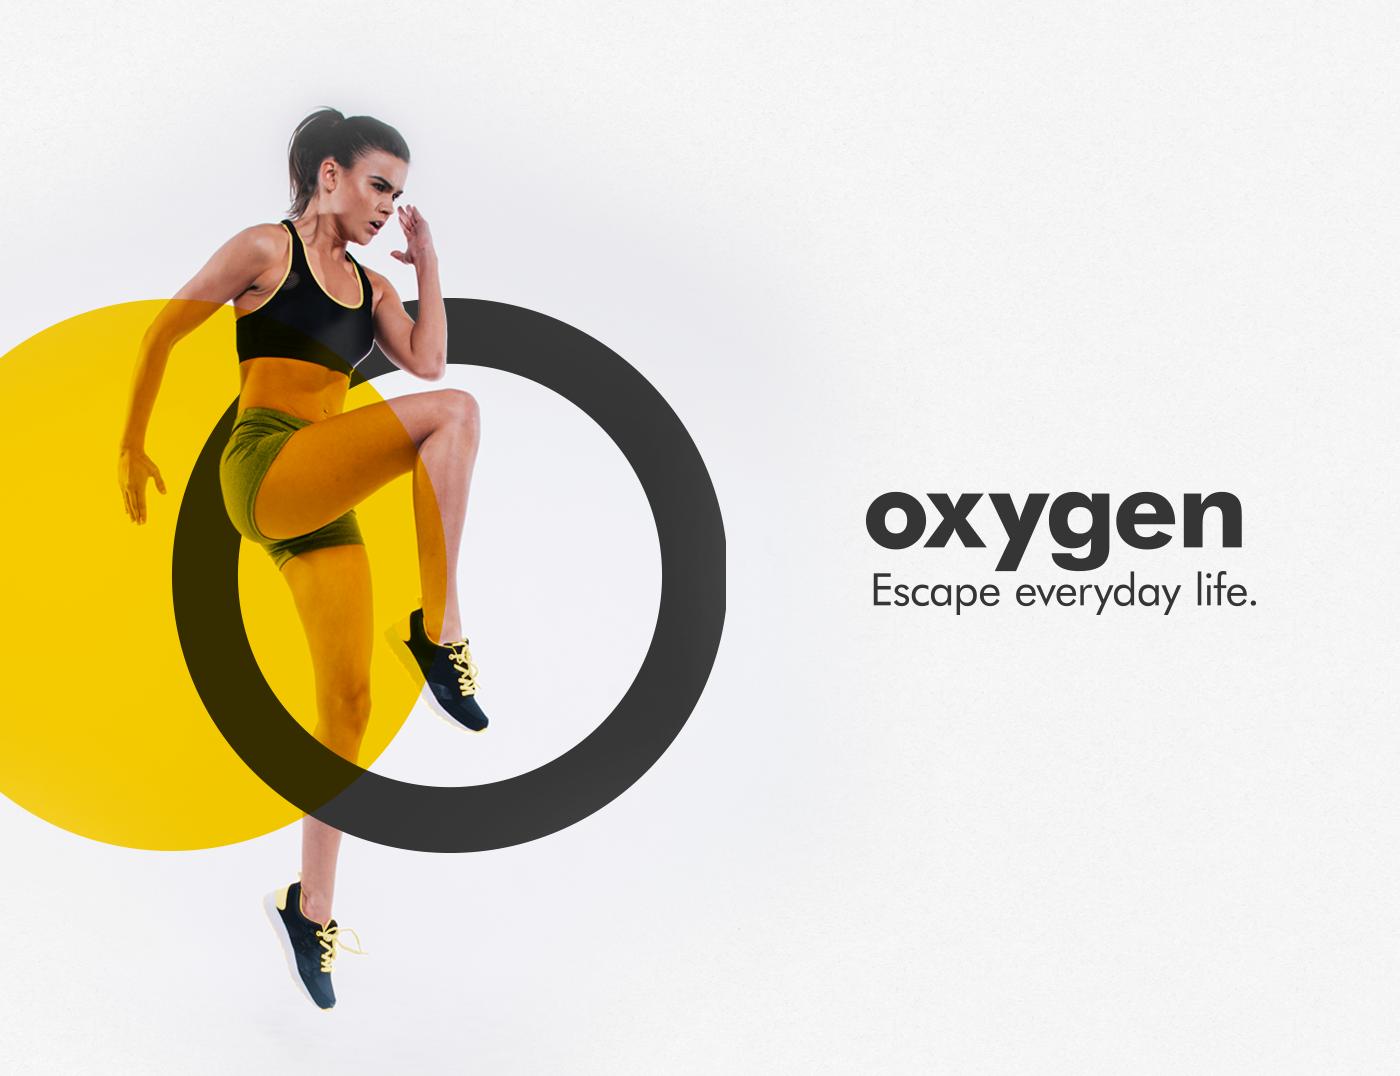 Oxygen Traningsanlaggning Logo Design Branding In 2020 Fitness Logo Design Fitness Branding Fitness Design